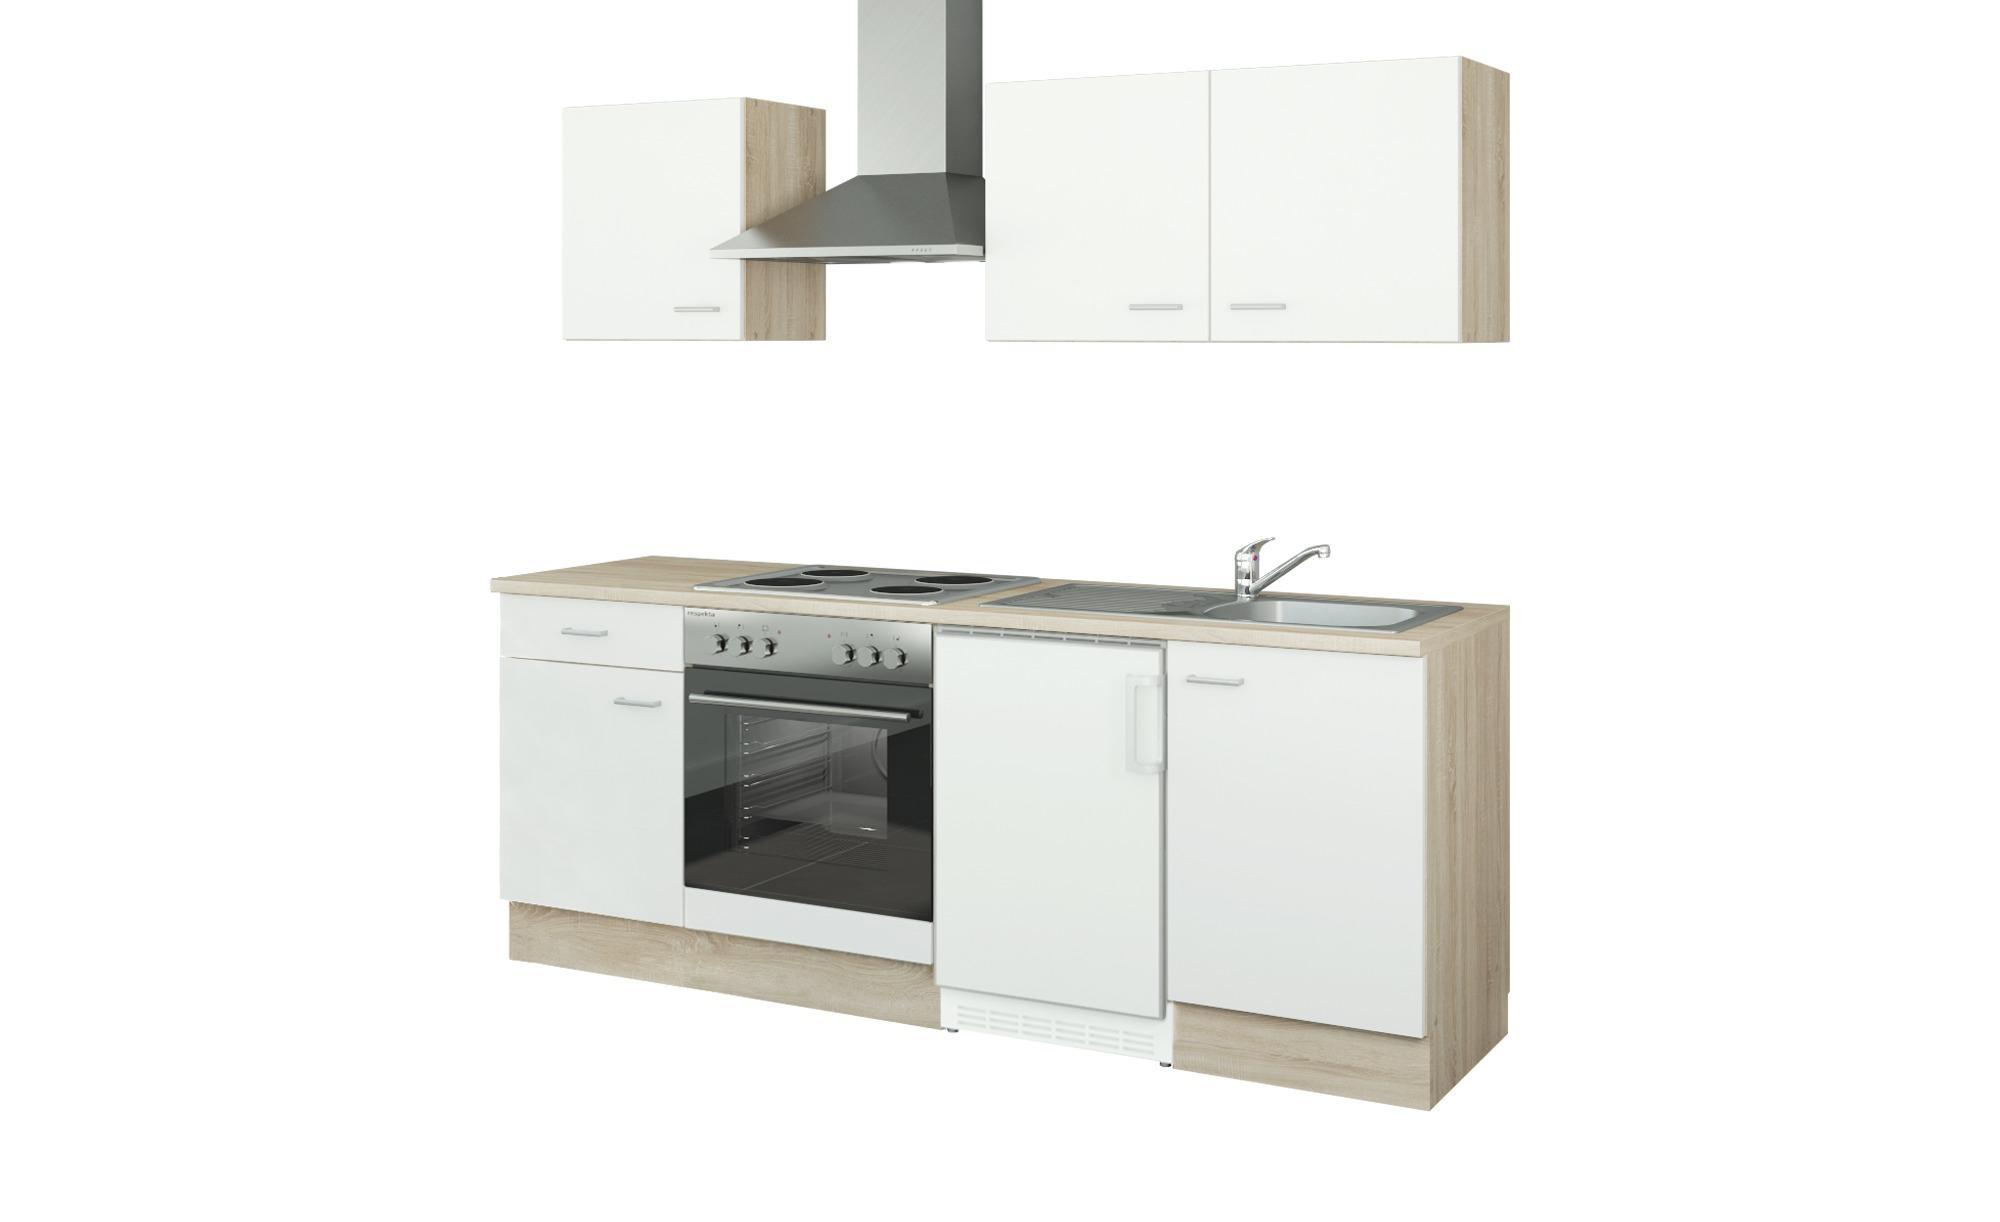 Küchenblock Mit E Geräten